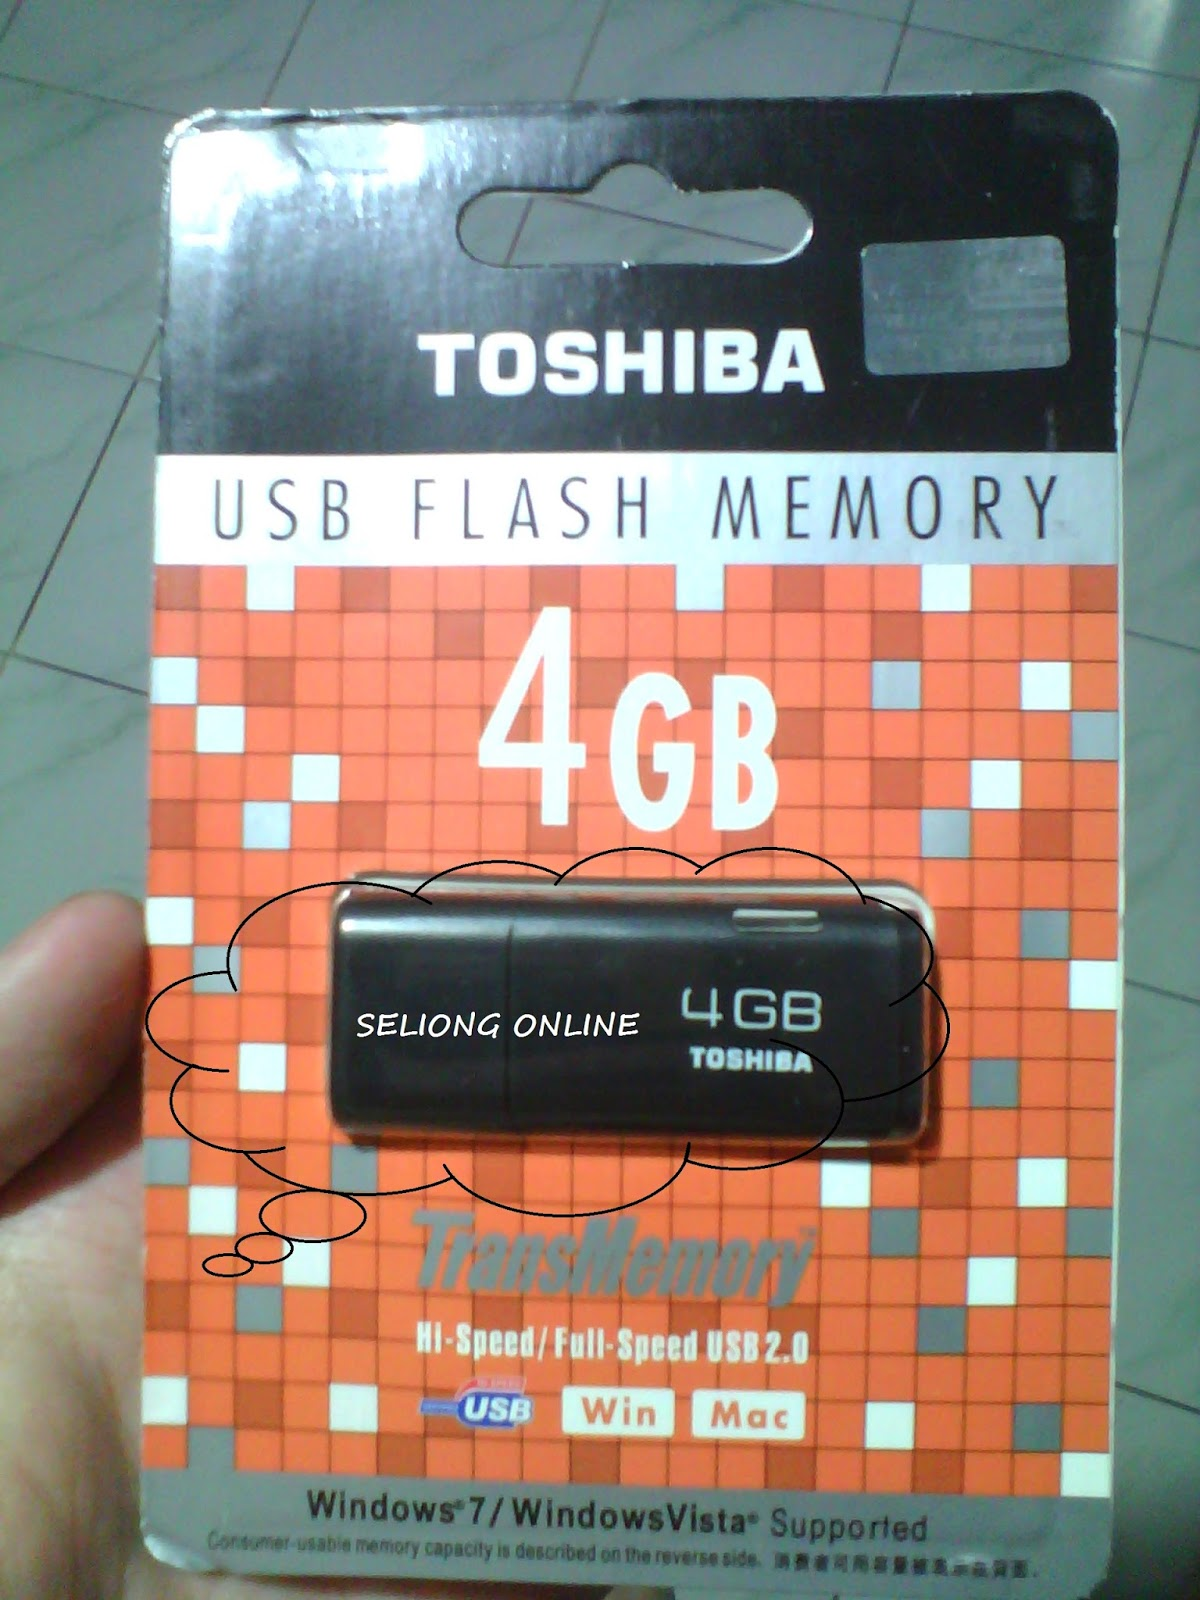 Jual Flashdisk Toshiba 4gb Promo Murah Flashdrive Ter Flasdisk 32 Gb Flash Drive Huat Cai Shop Tokopedia